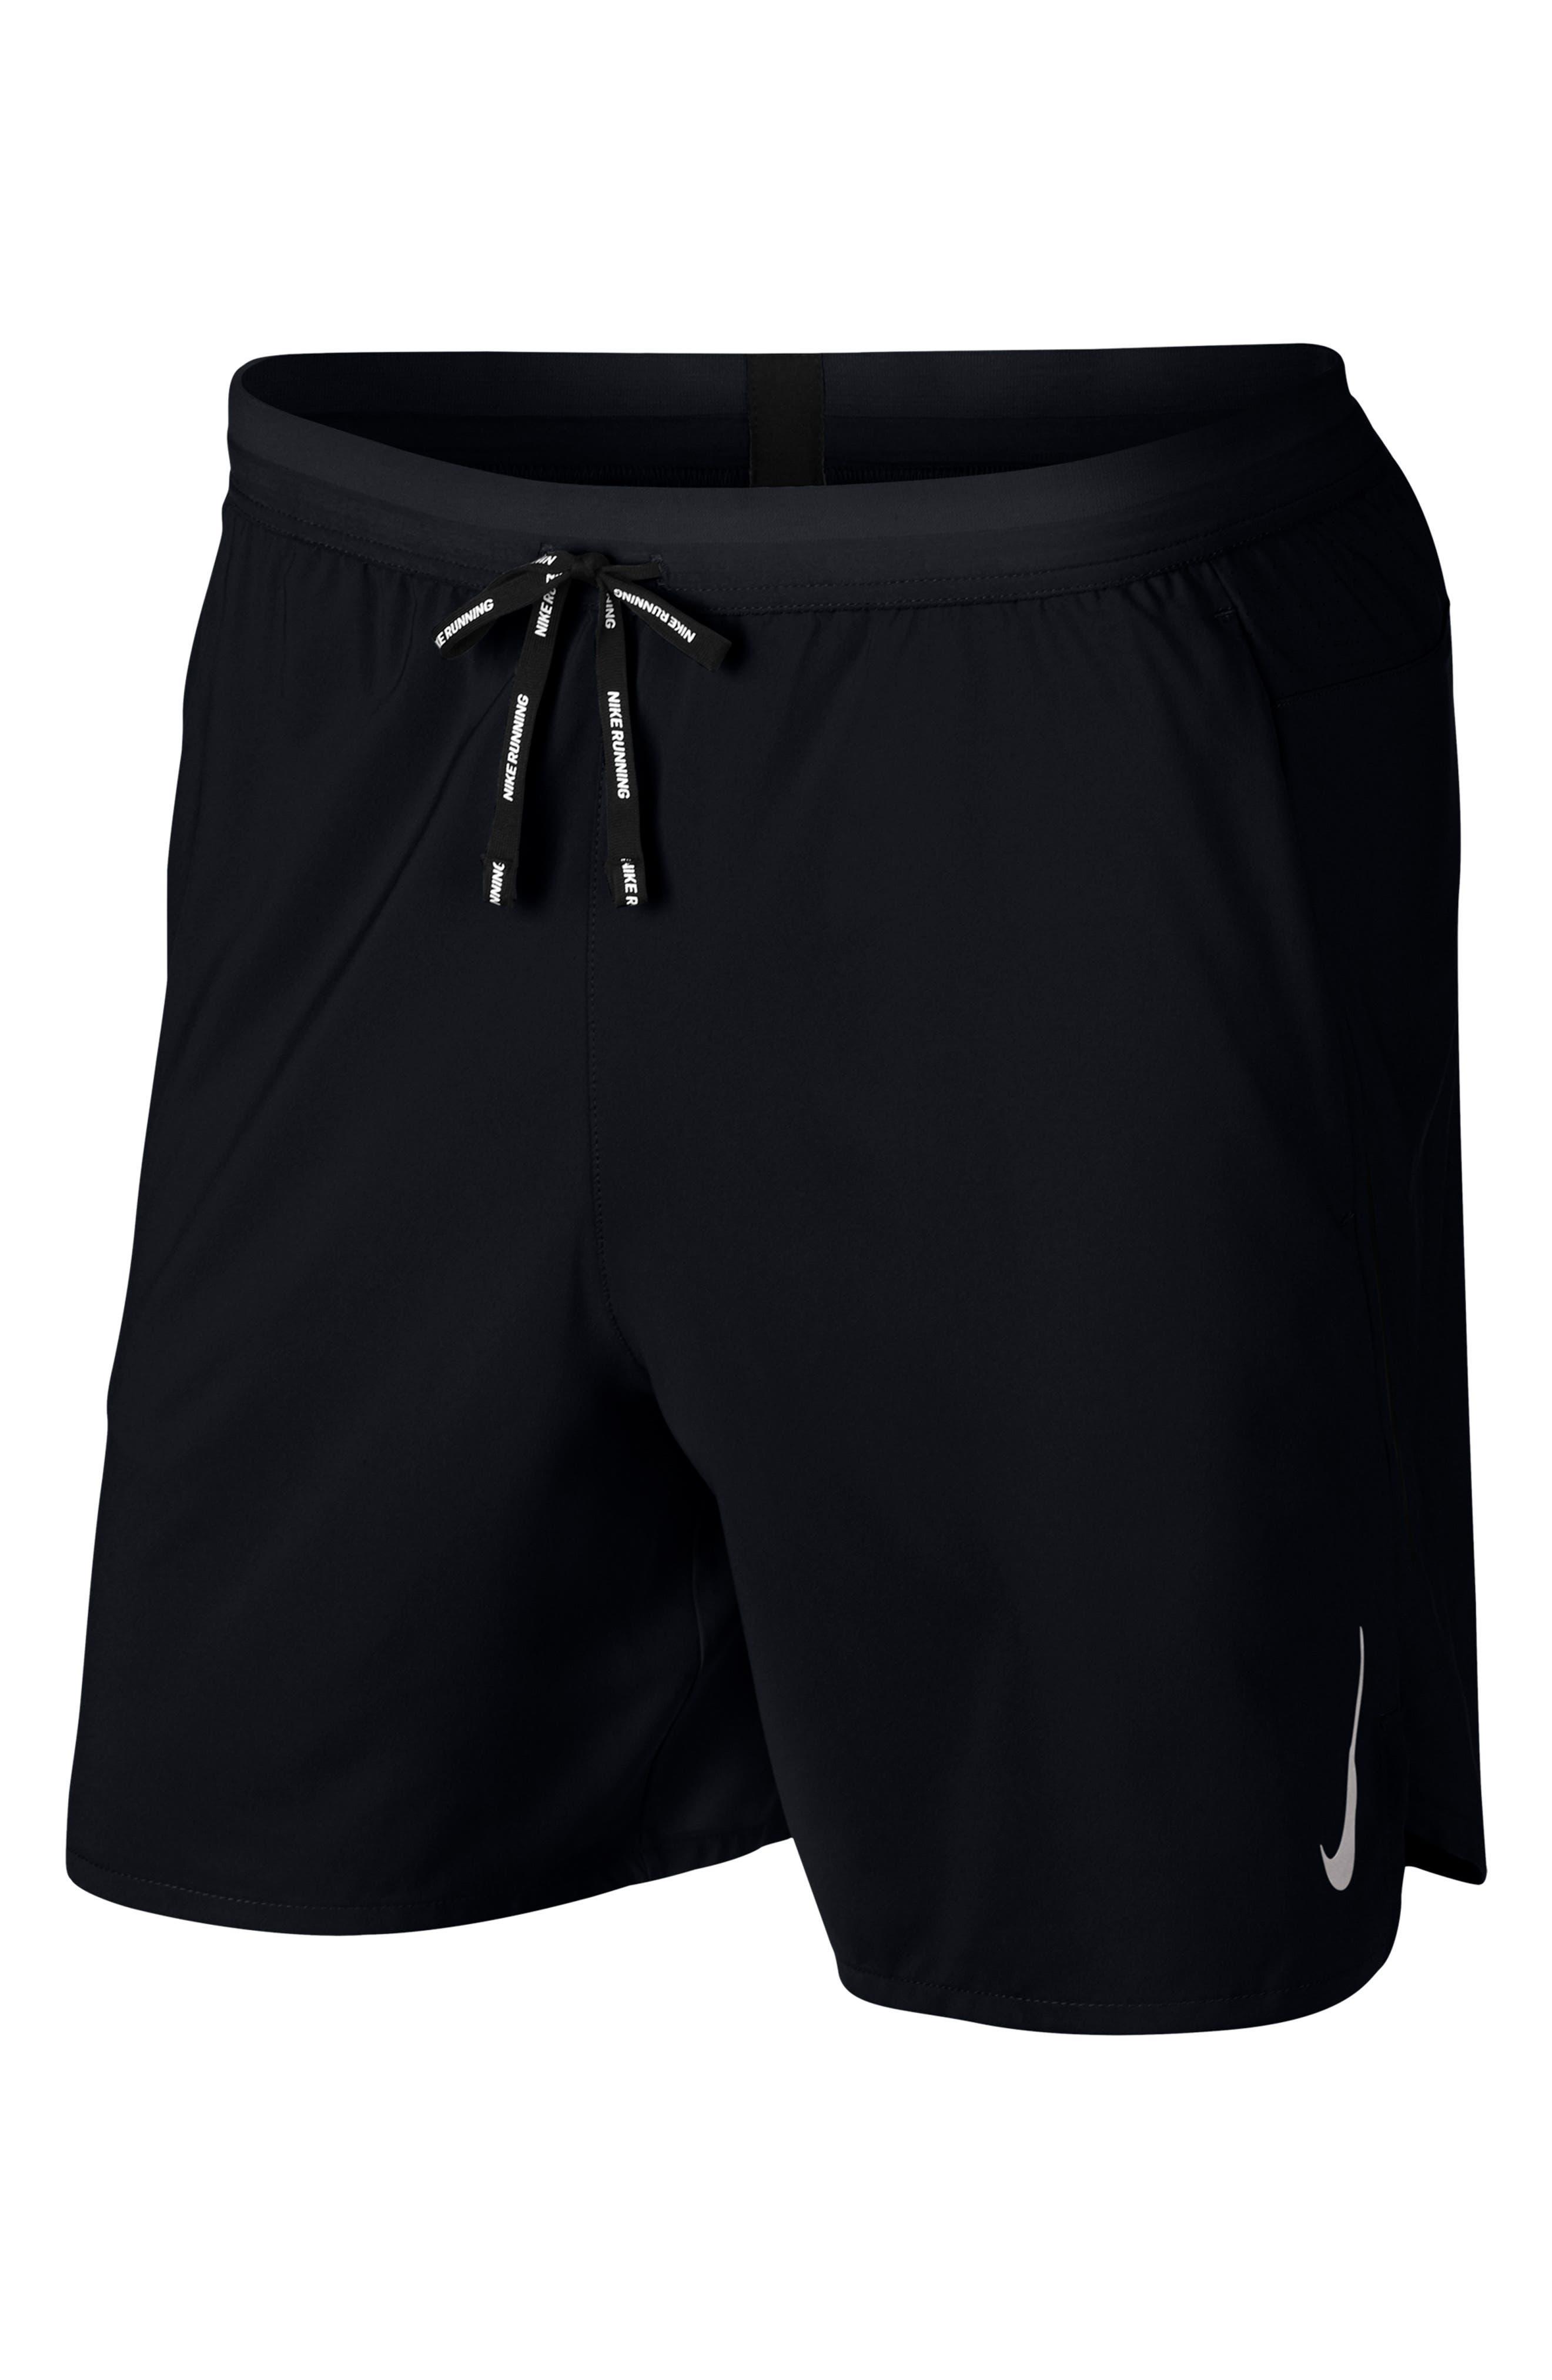 Shorts Men's Clothing Bar Iii 3 Soft Rose Pink Medium 32 34 Draw String Athletic Lounge Sweat Shorts